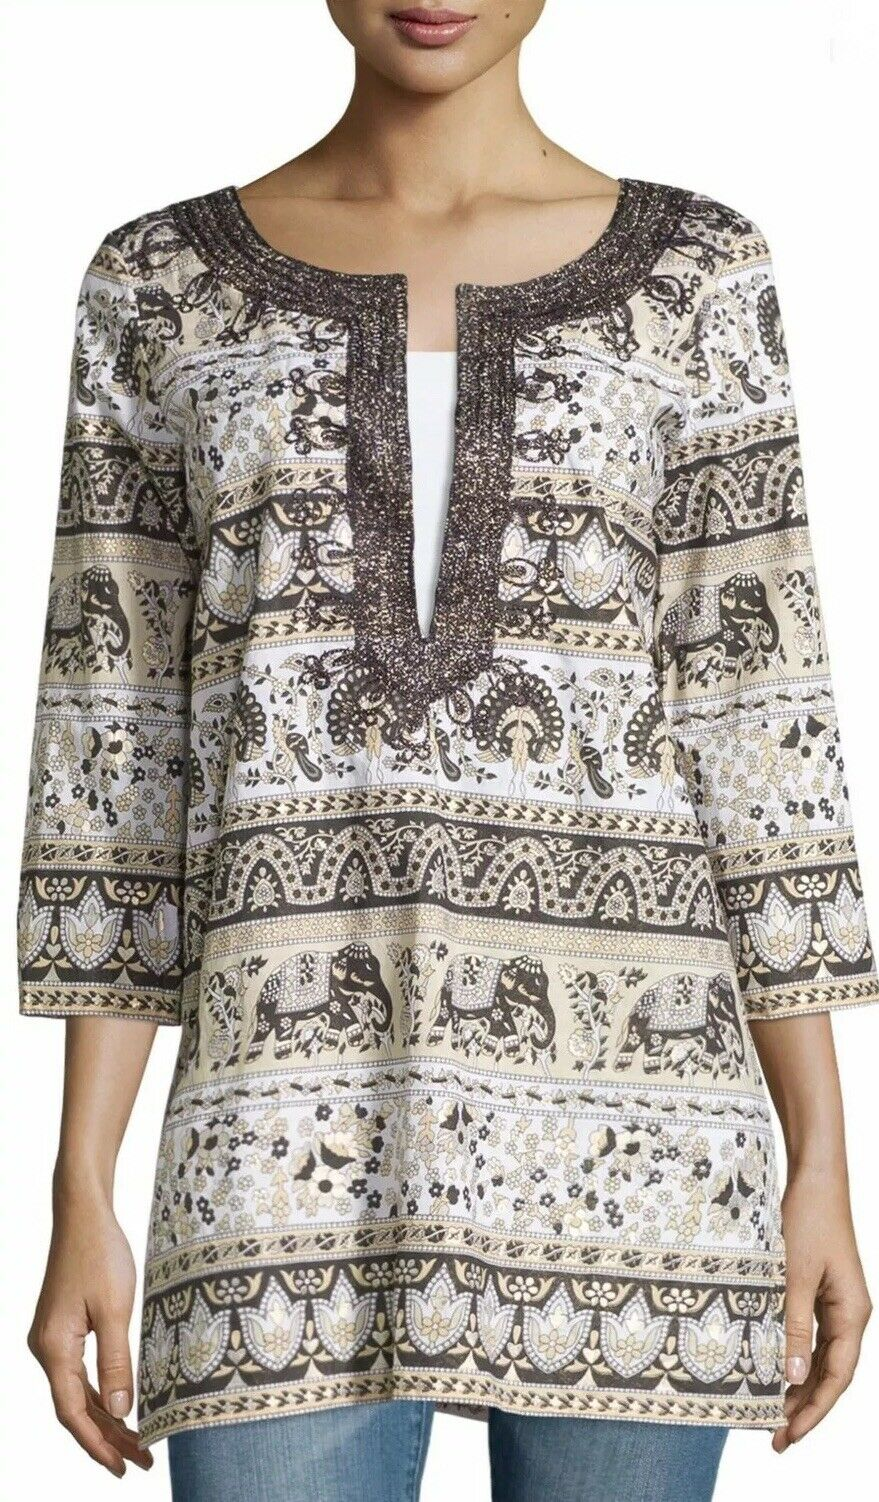 Calypso St Barth Olipant Printed Cotton Tunic Elephant Embroidered M